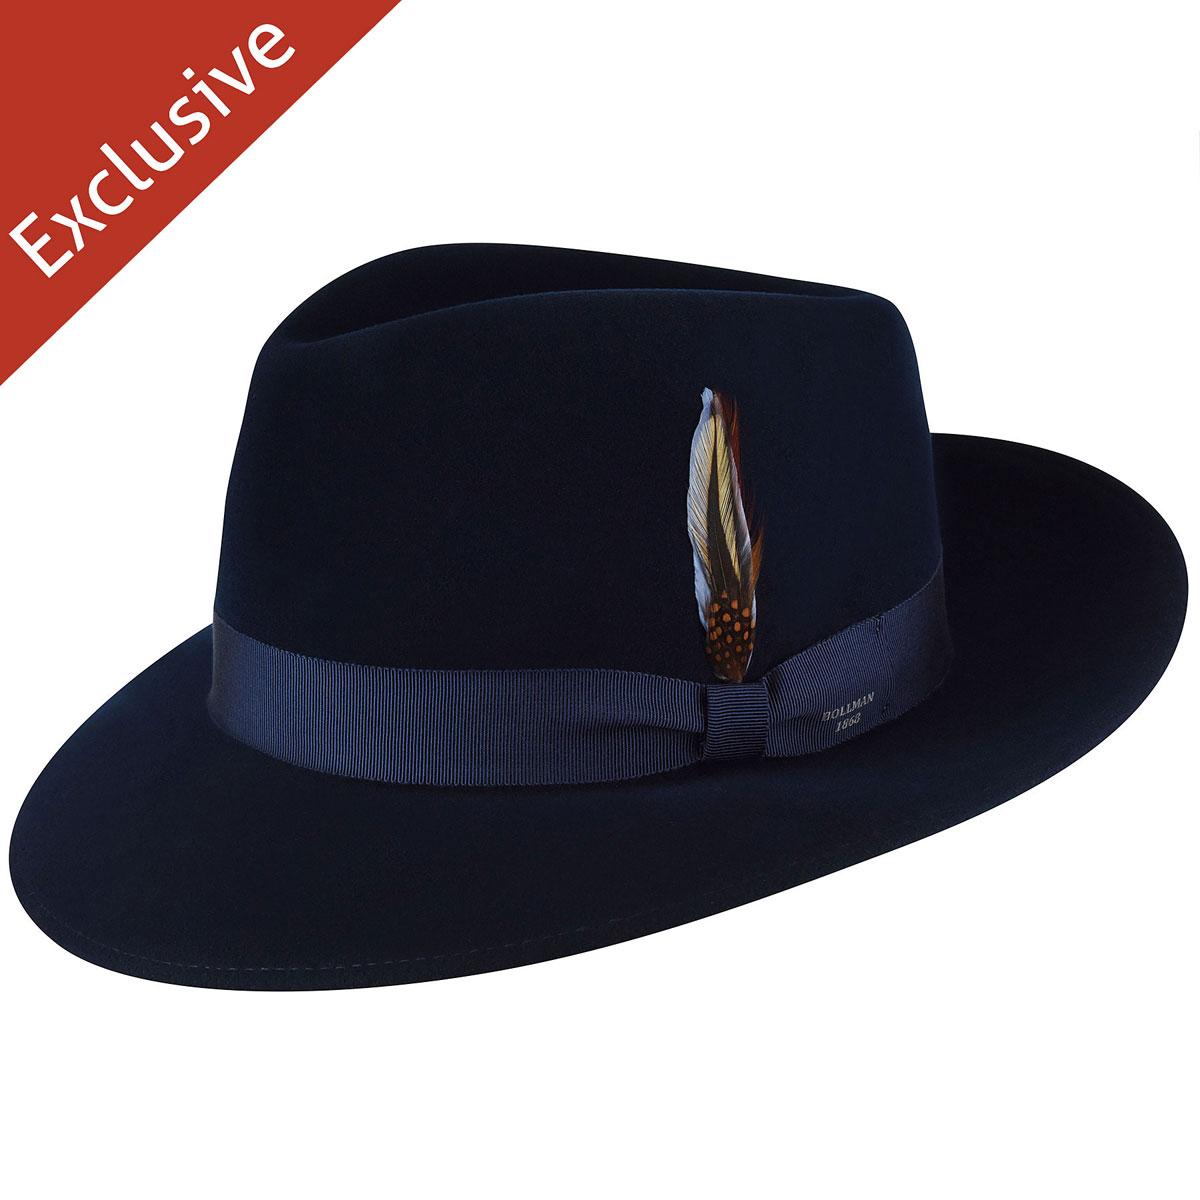 Gene H. Fedora - Exclusive - Dark Royal/S